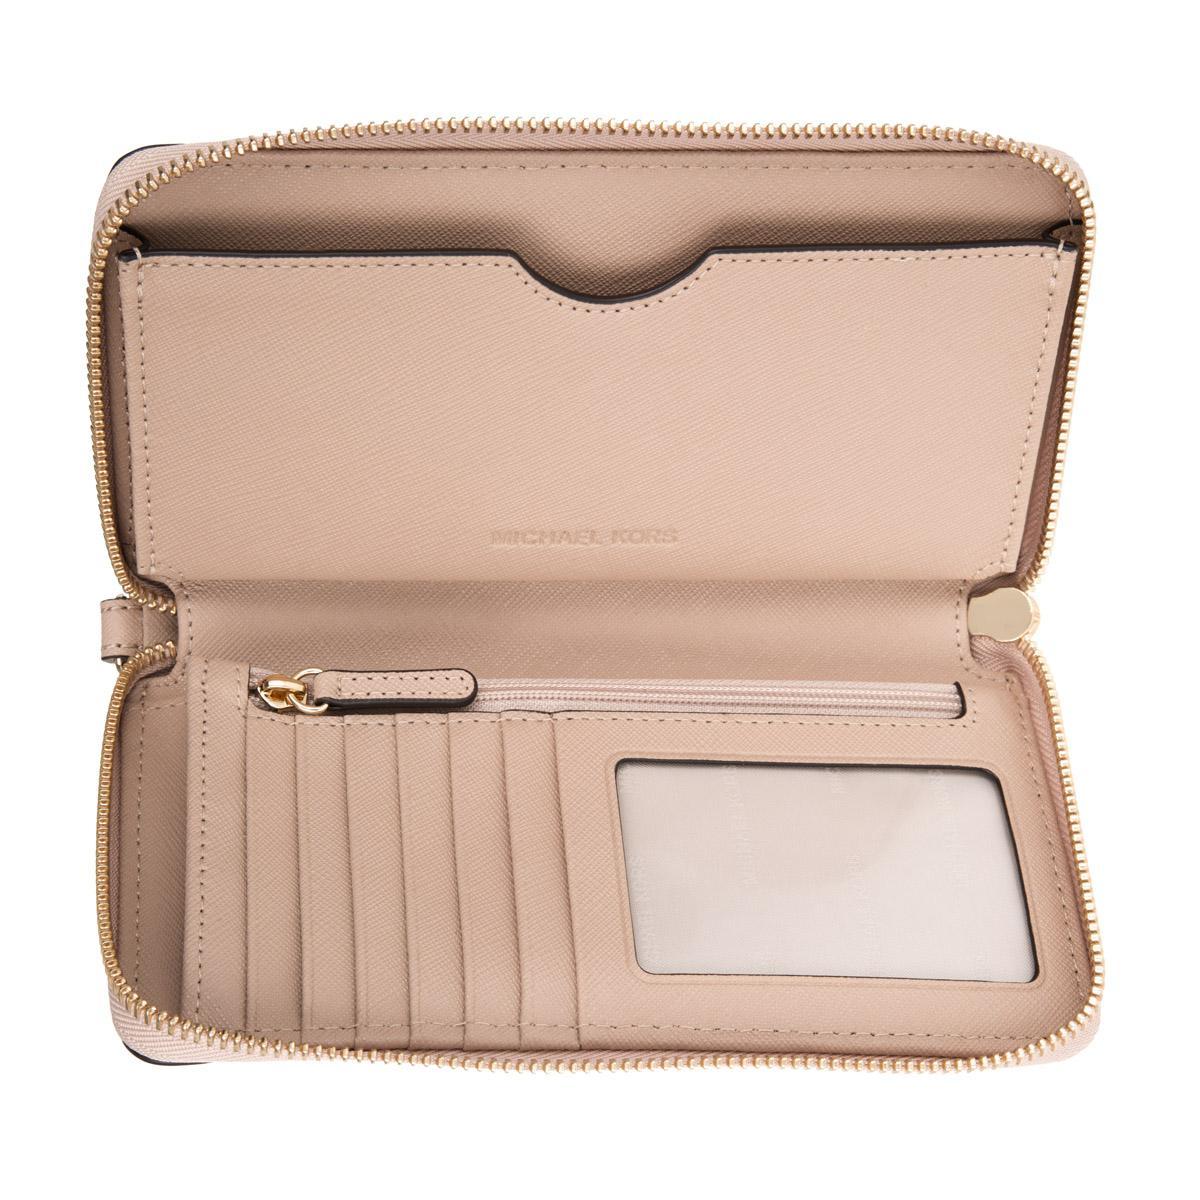 f6733c98c30778 Michael Kors Mercer Lg Flat Multifunction Phone Case Leather Oyster ...